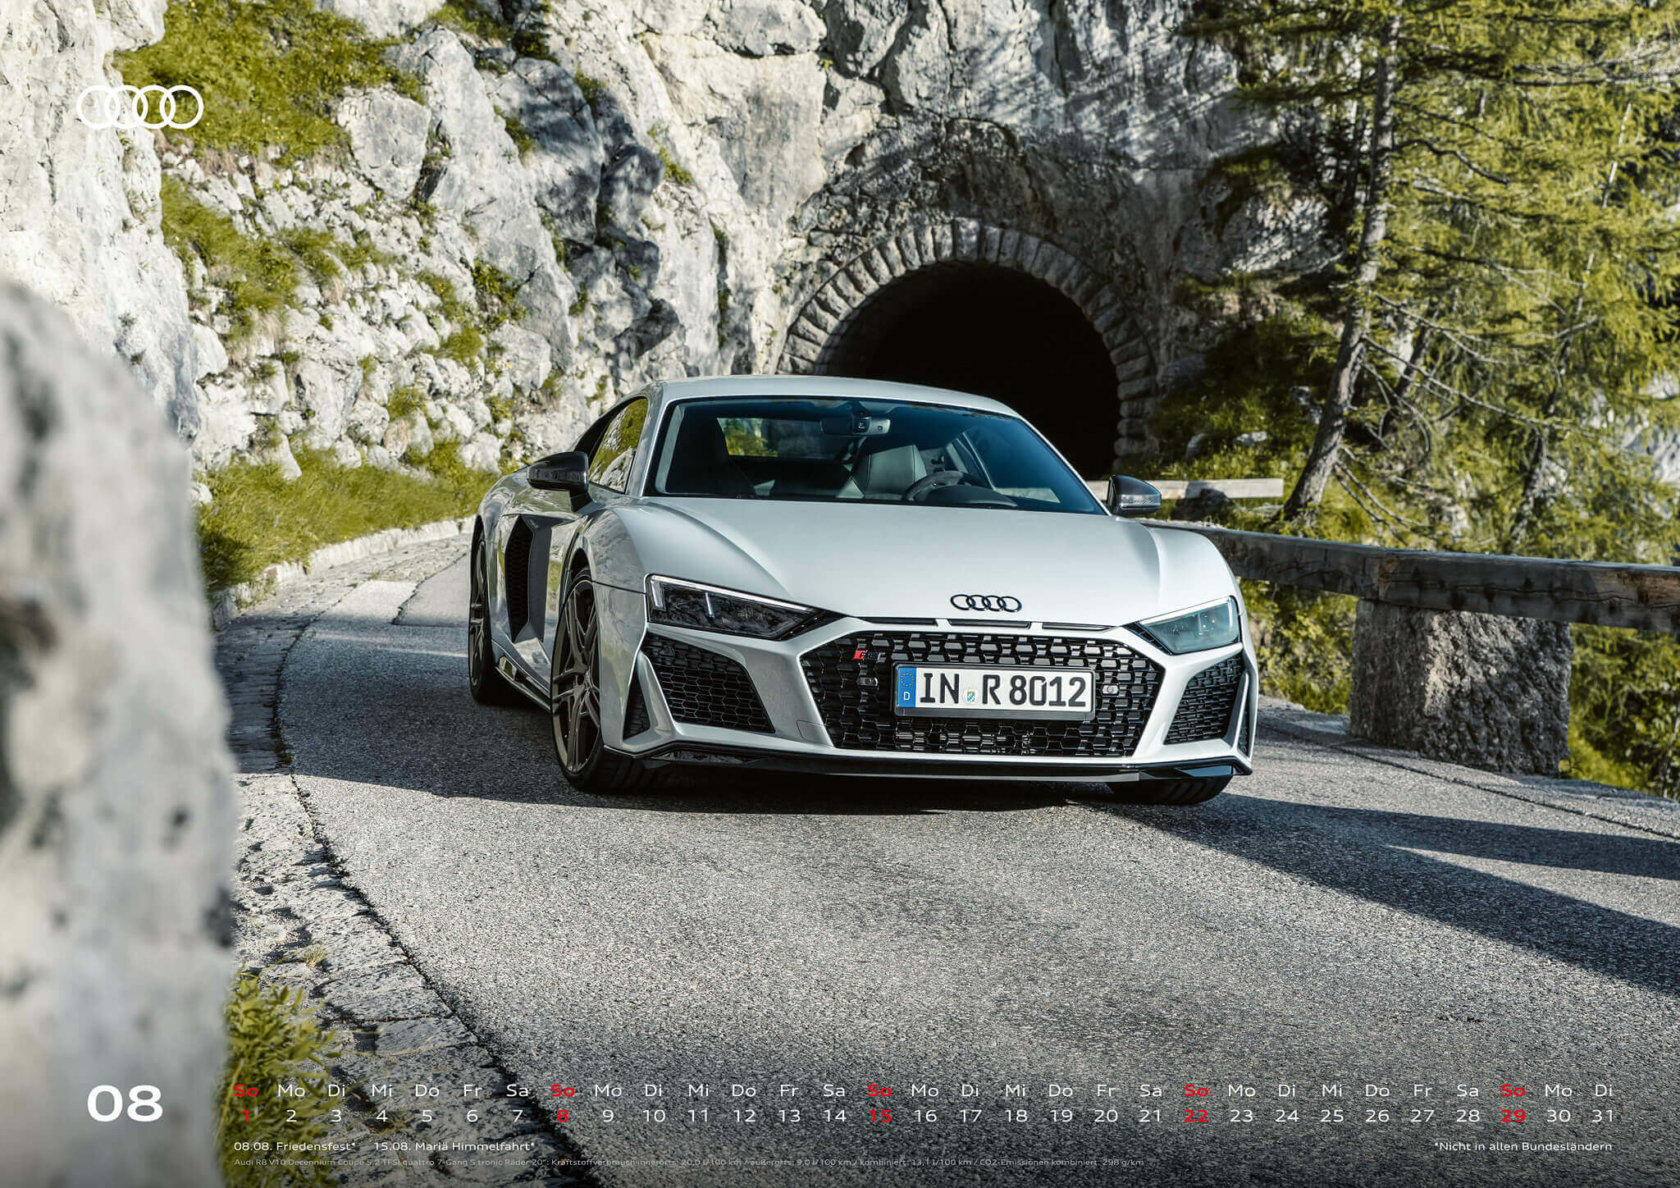 Audi Kalender 2021 - DIN A2 / Audi R8 Coupé Decennium